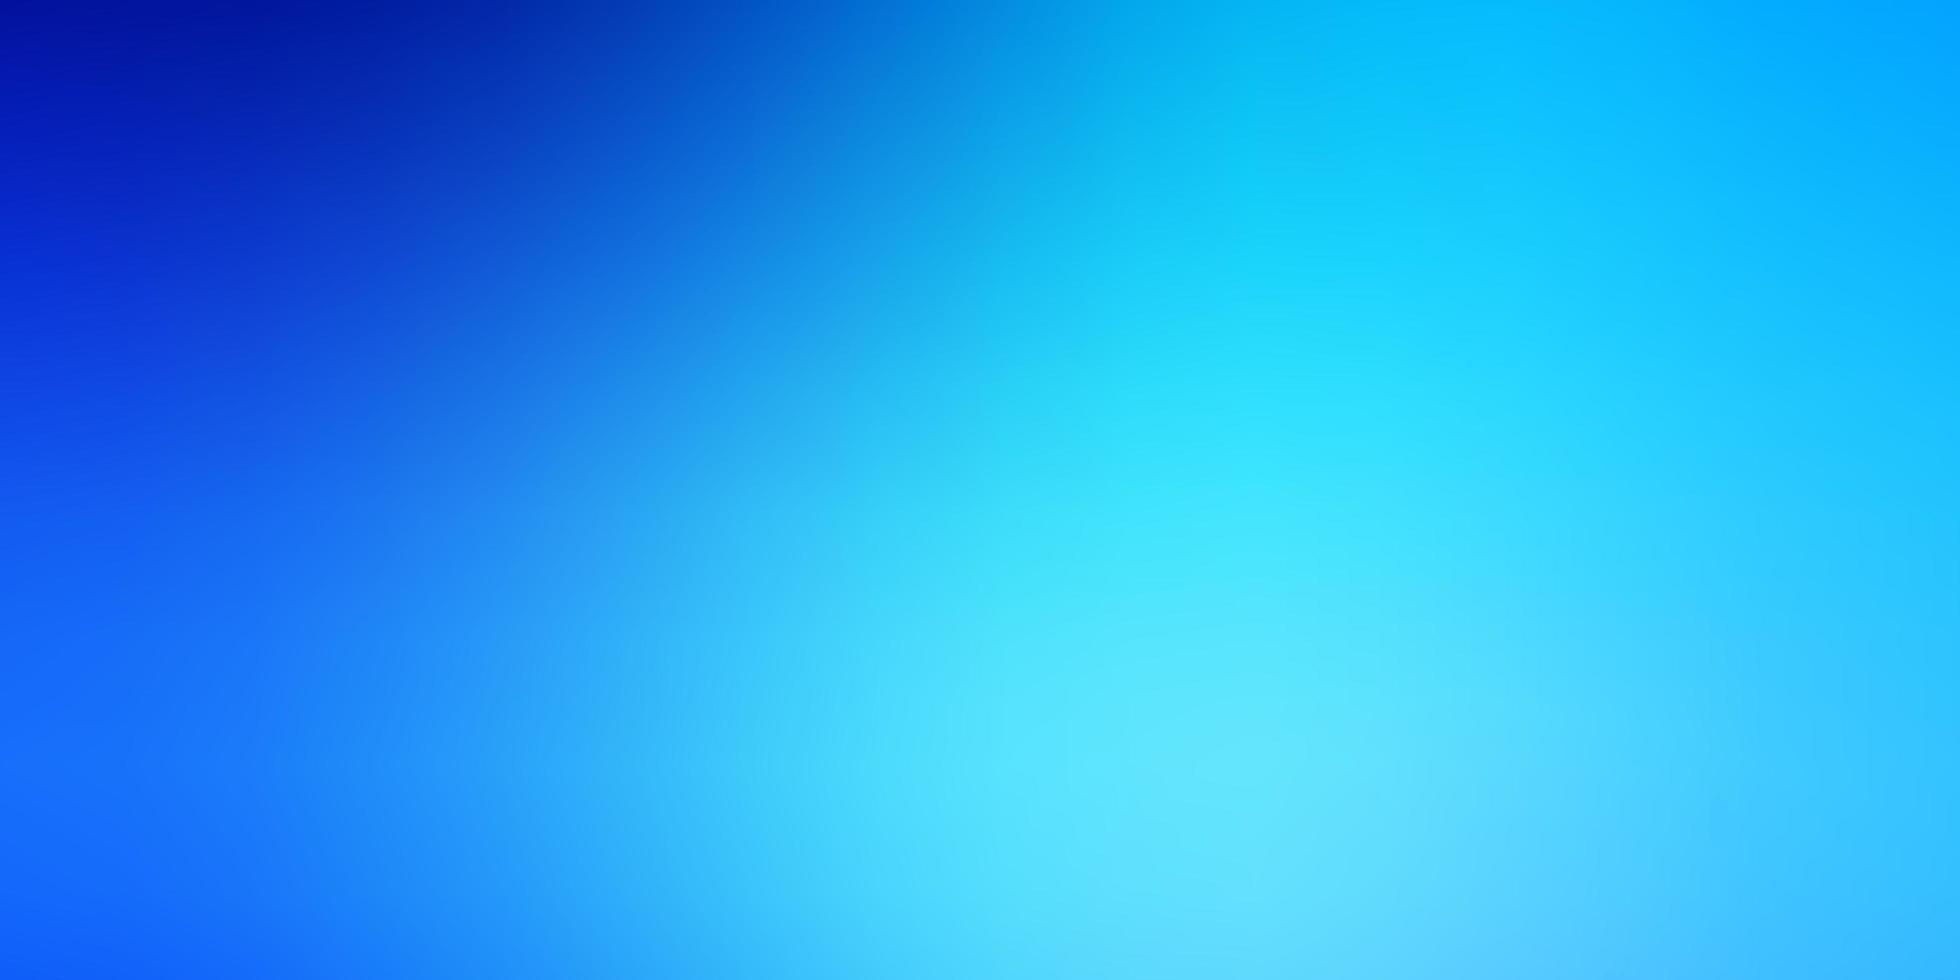 Light blue colorful blur backdrop. vector